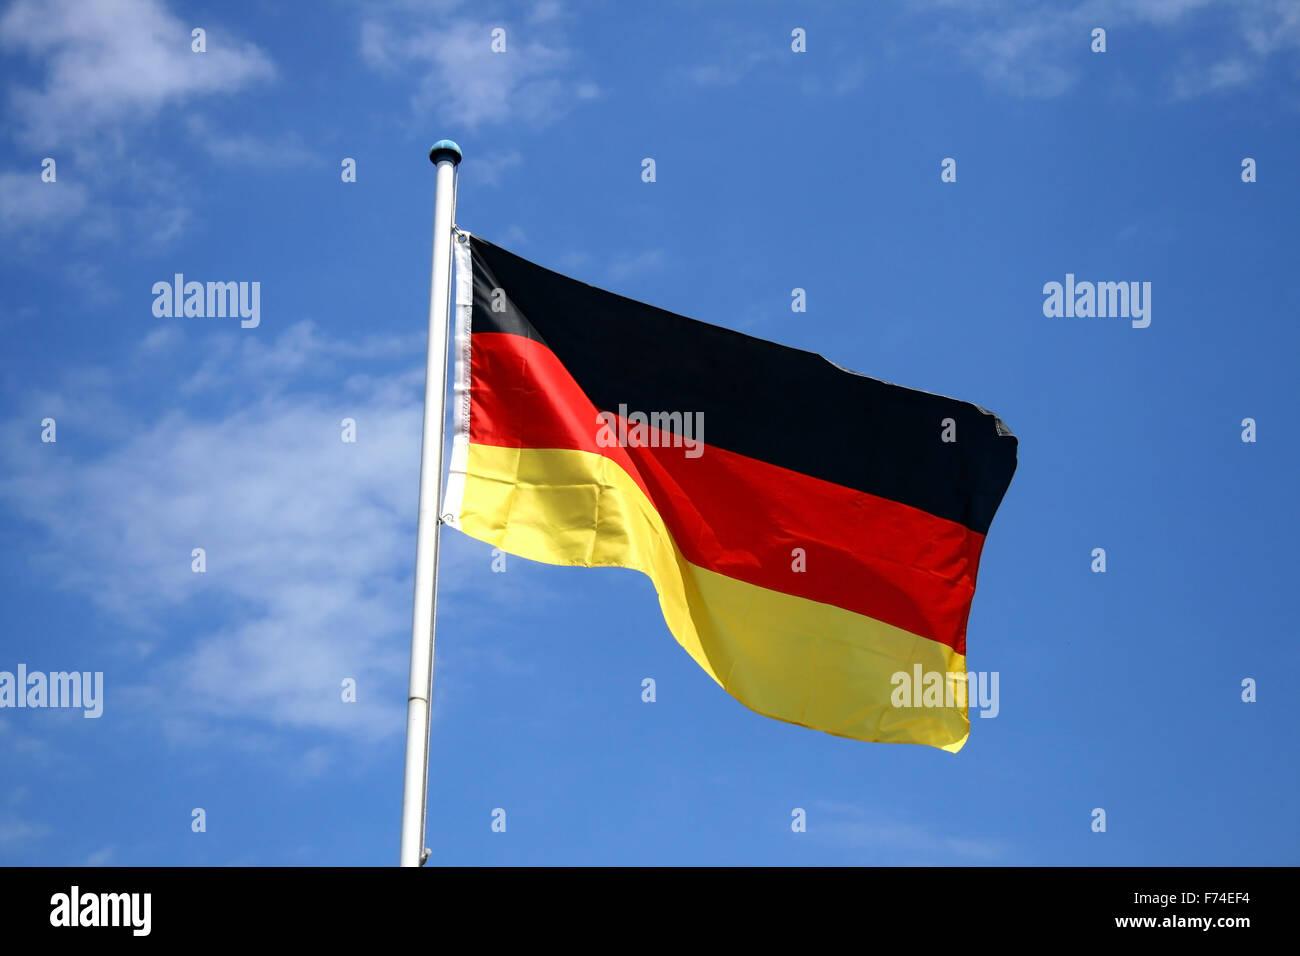 german flag - Stock Image